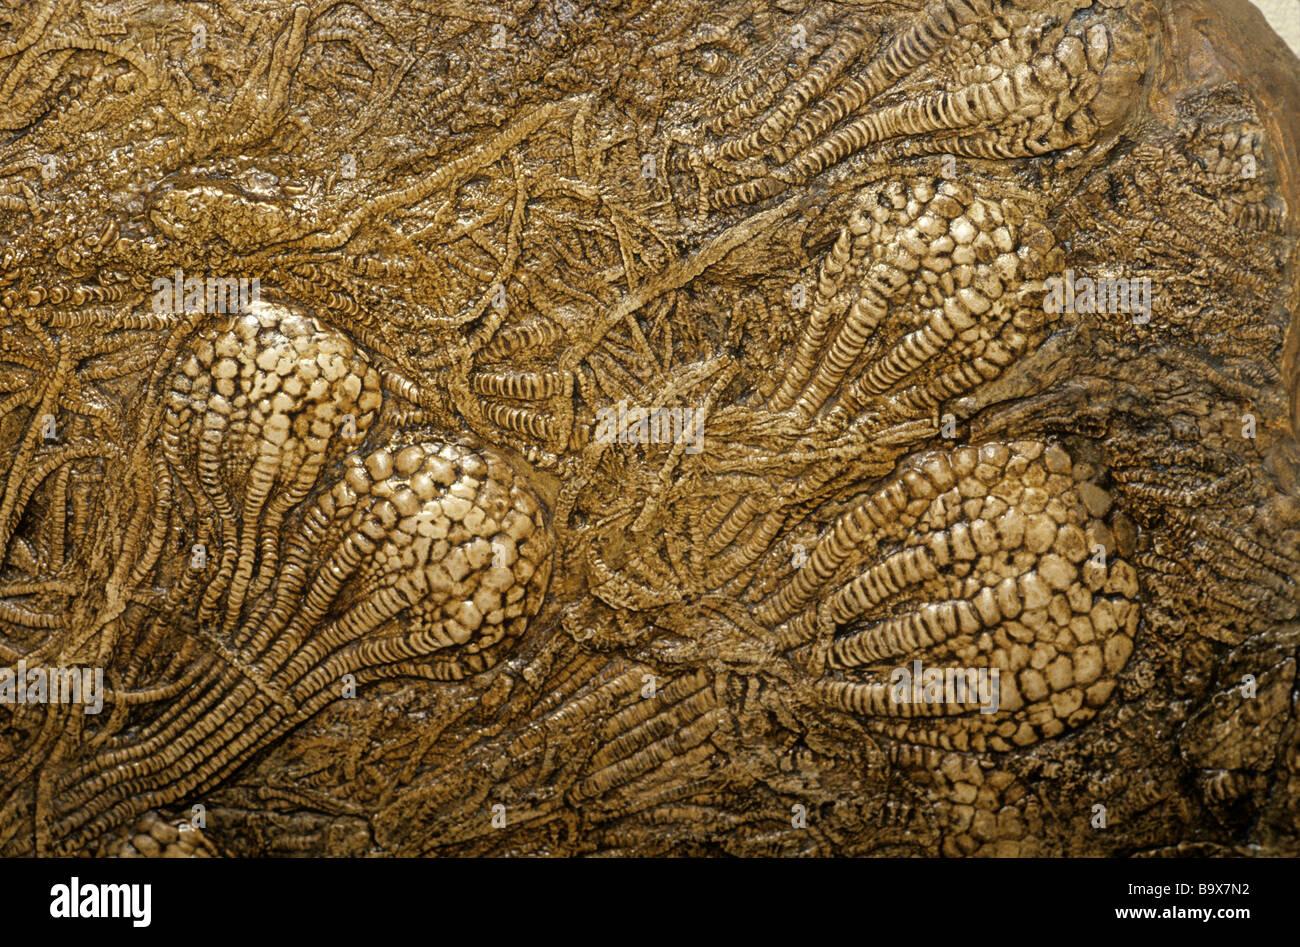 Crinoideos fósil desde finales del período Cretácico Formación Niobrara Kansas Foto de stock